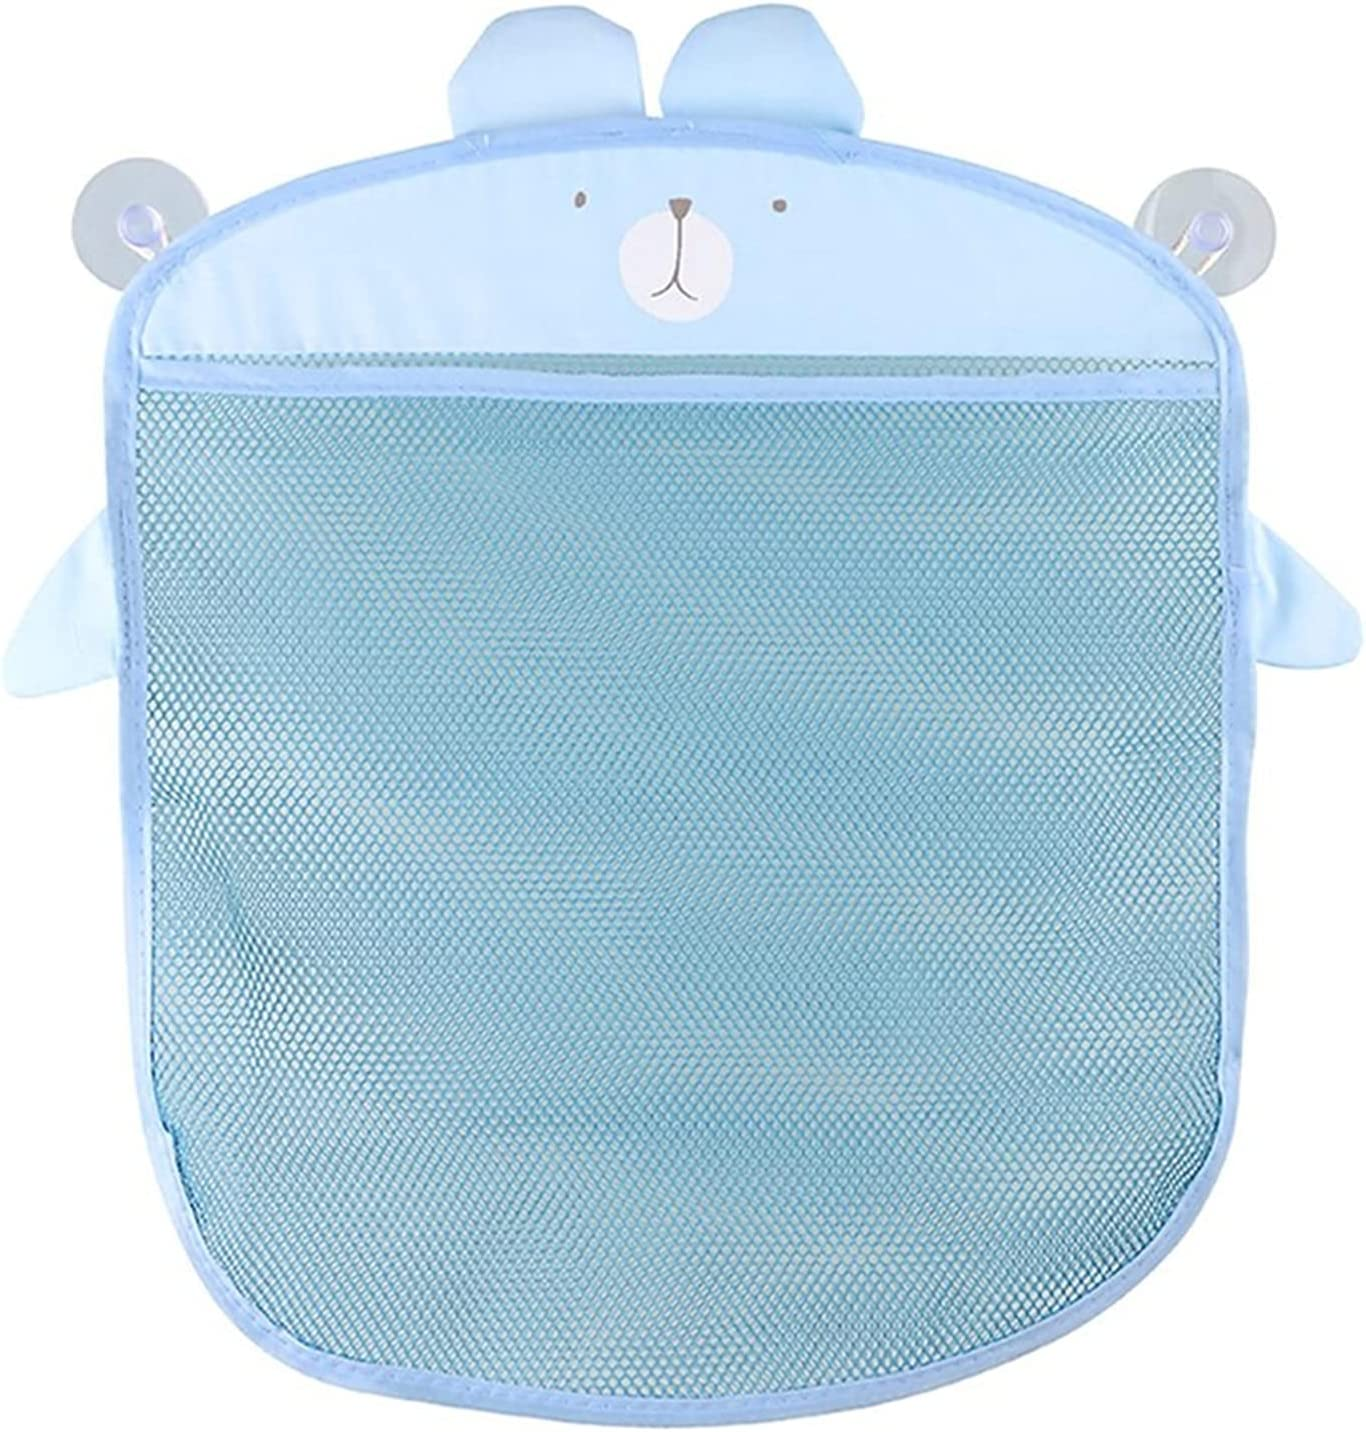 YUMYANJIN Storage Bag Popular popular Baby Bathroom Toys Ranking TOP6 Bath Organizer